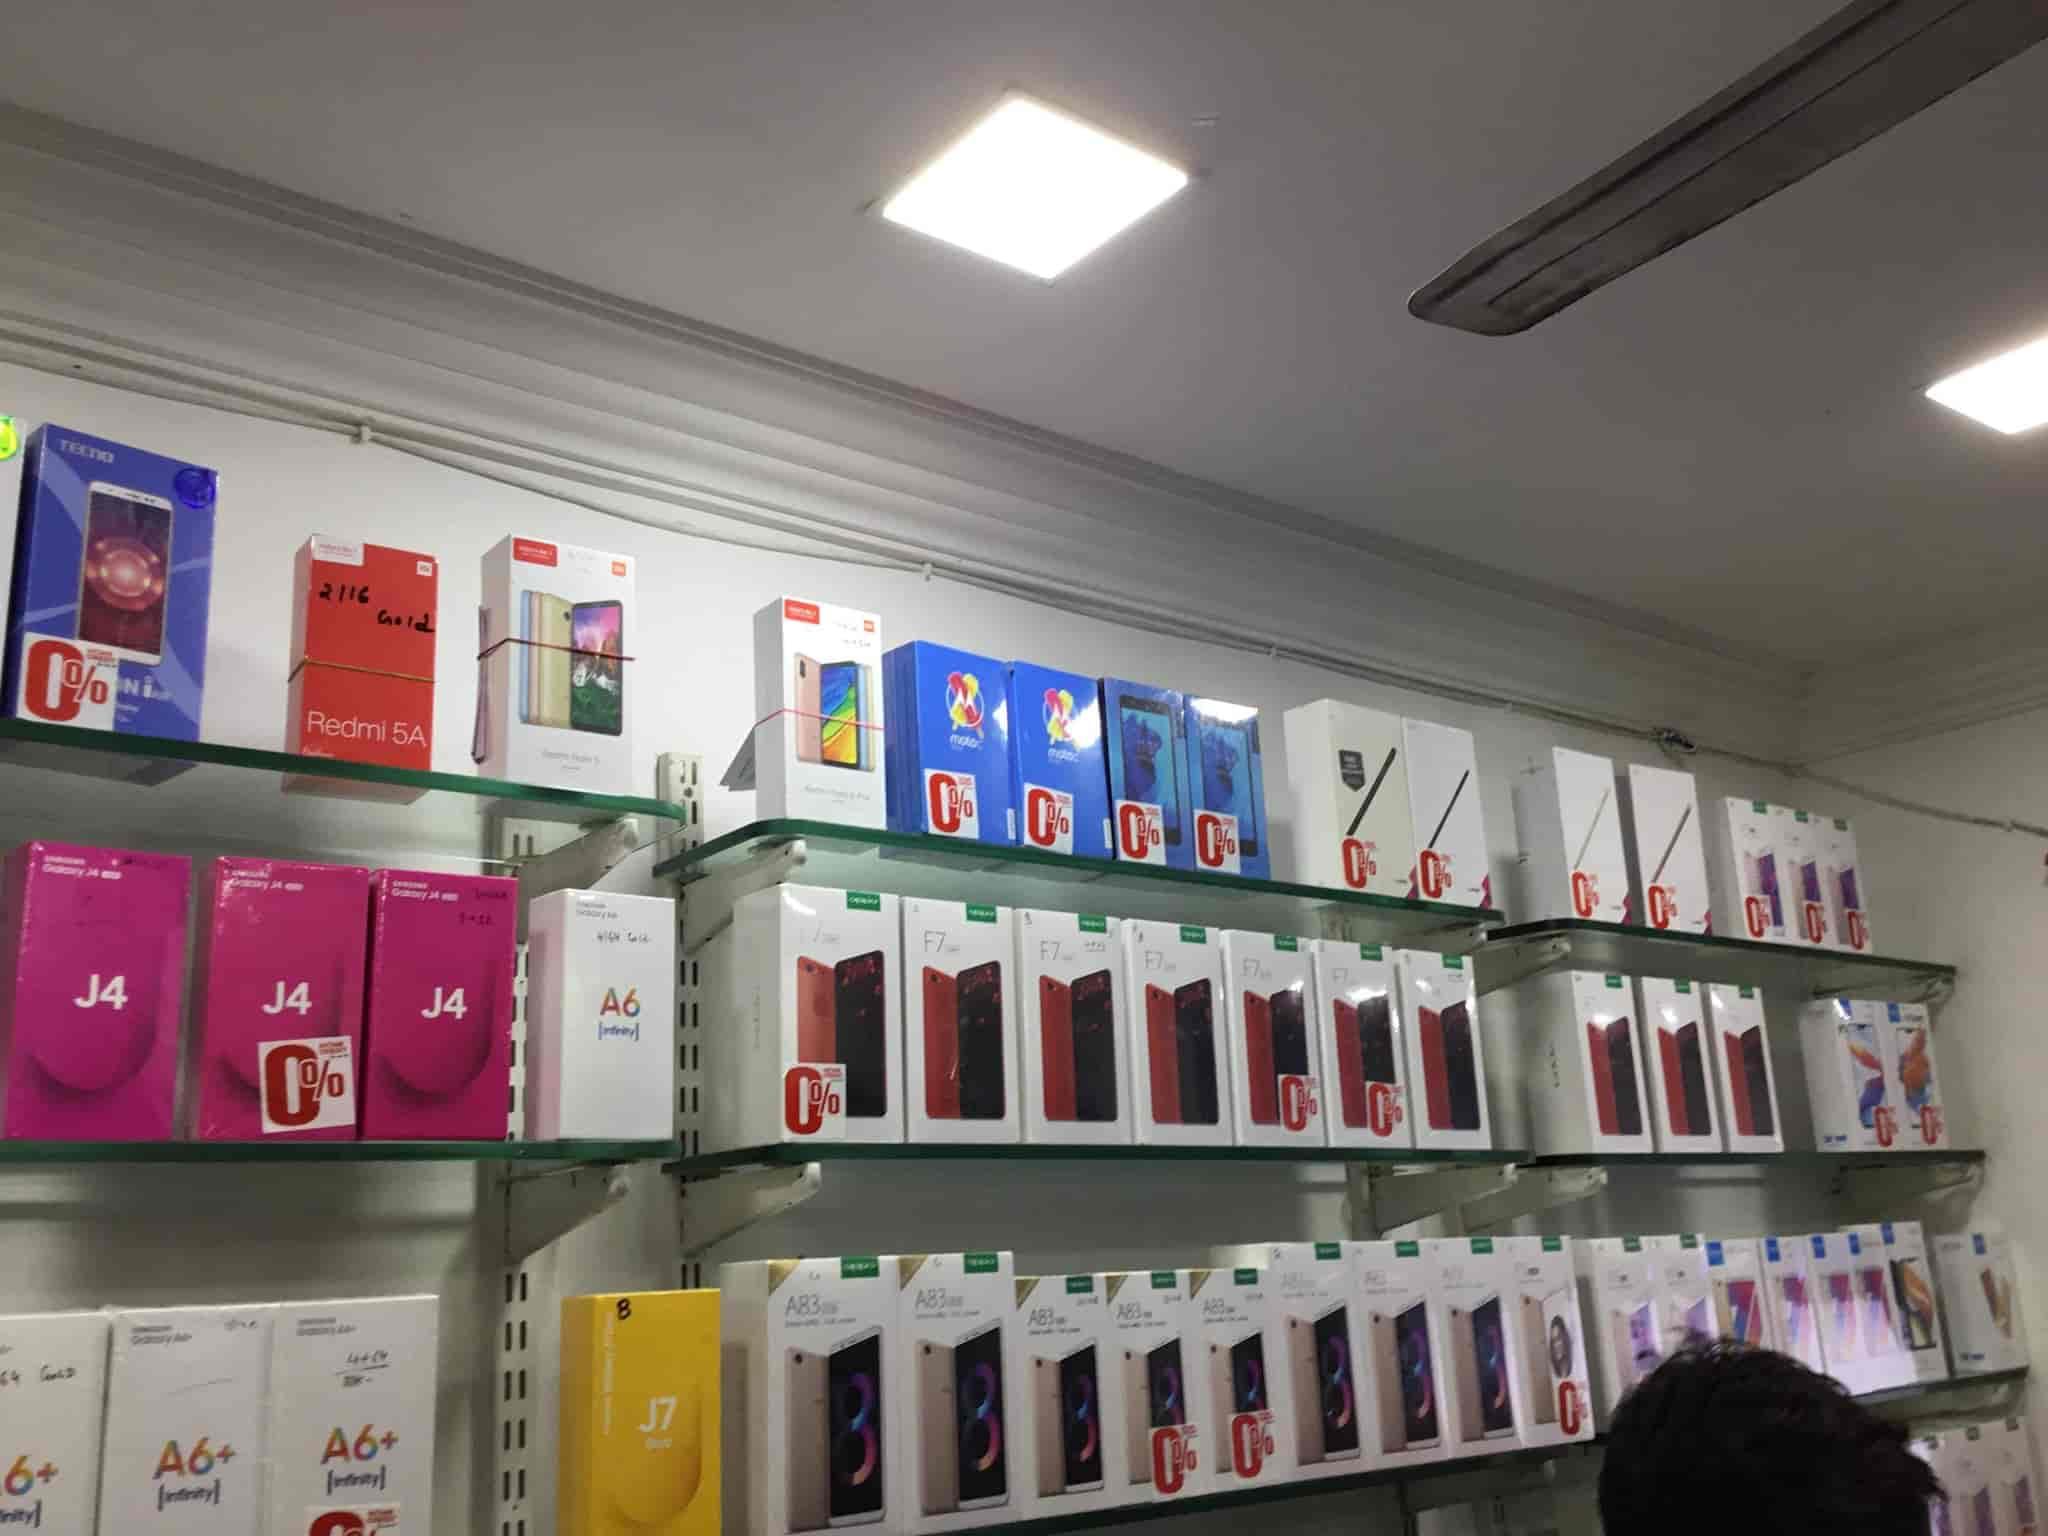 Yash munication Naranpura Vistar Mobile Phone Dealers in Ahmedabad Justdial